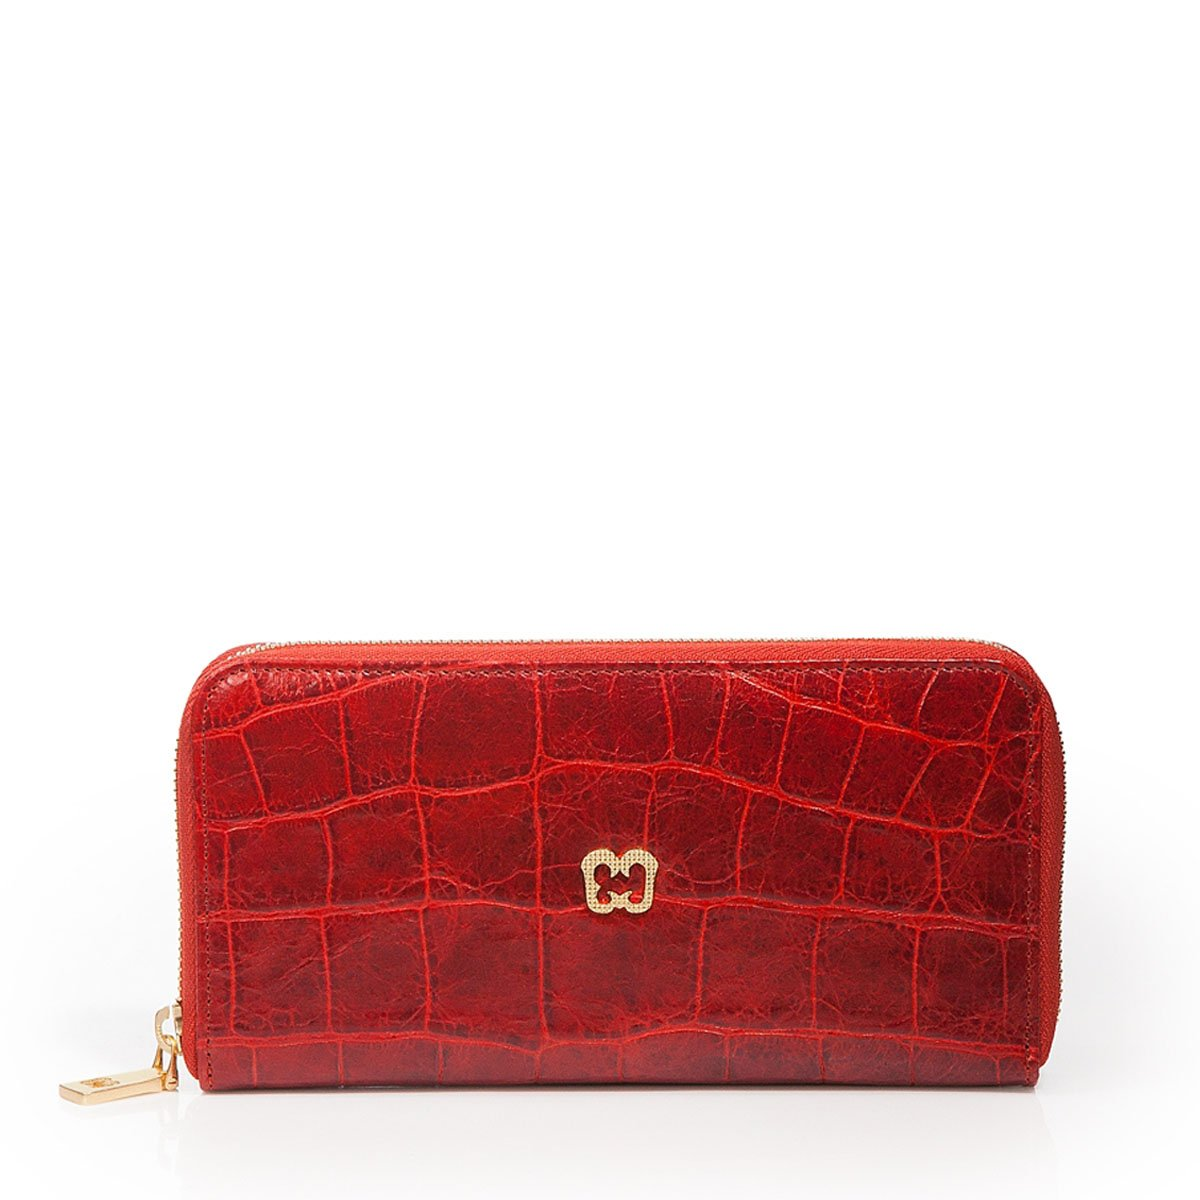 Eric Javits Luxury Fashion Designer Women's Handbag - Zip Wallet - Red